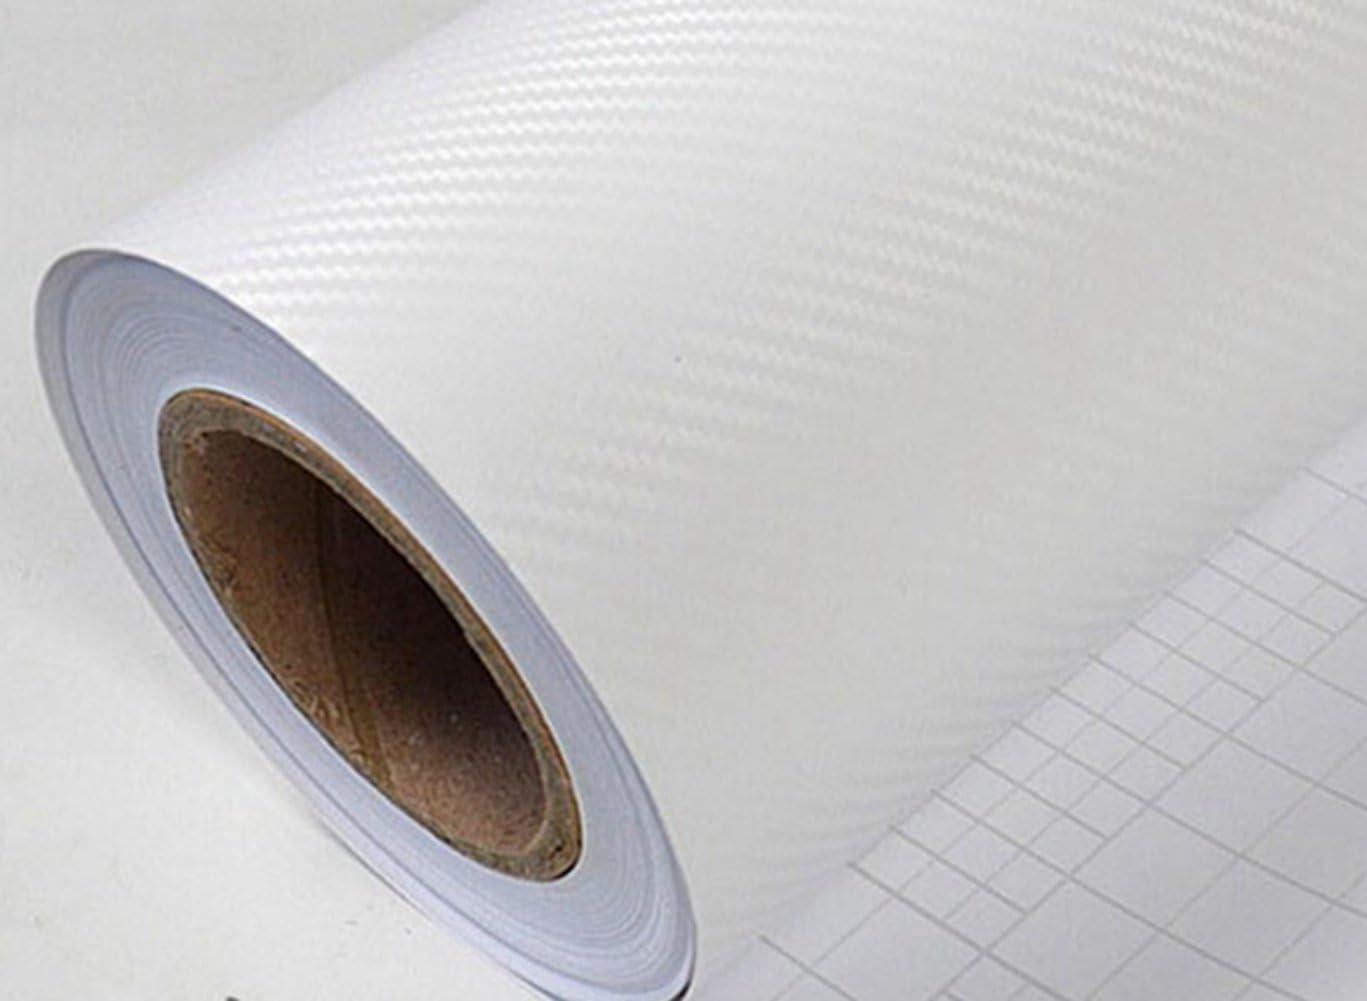 "Black Color Change Film Water Resistant Decoration Sticker Furniture Sticker 11.8/""X 78.7/"" Carbon Fiber self-Adhesive Paper,Anti-Scratch Film,Color Change Film,Contact Paper"